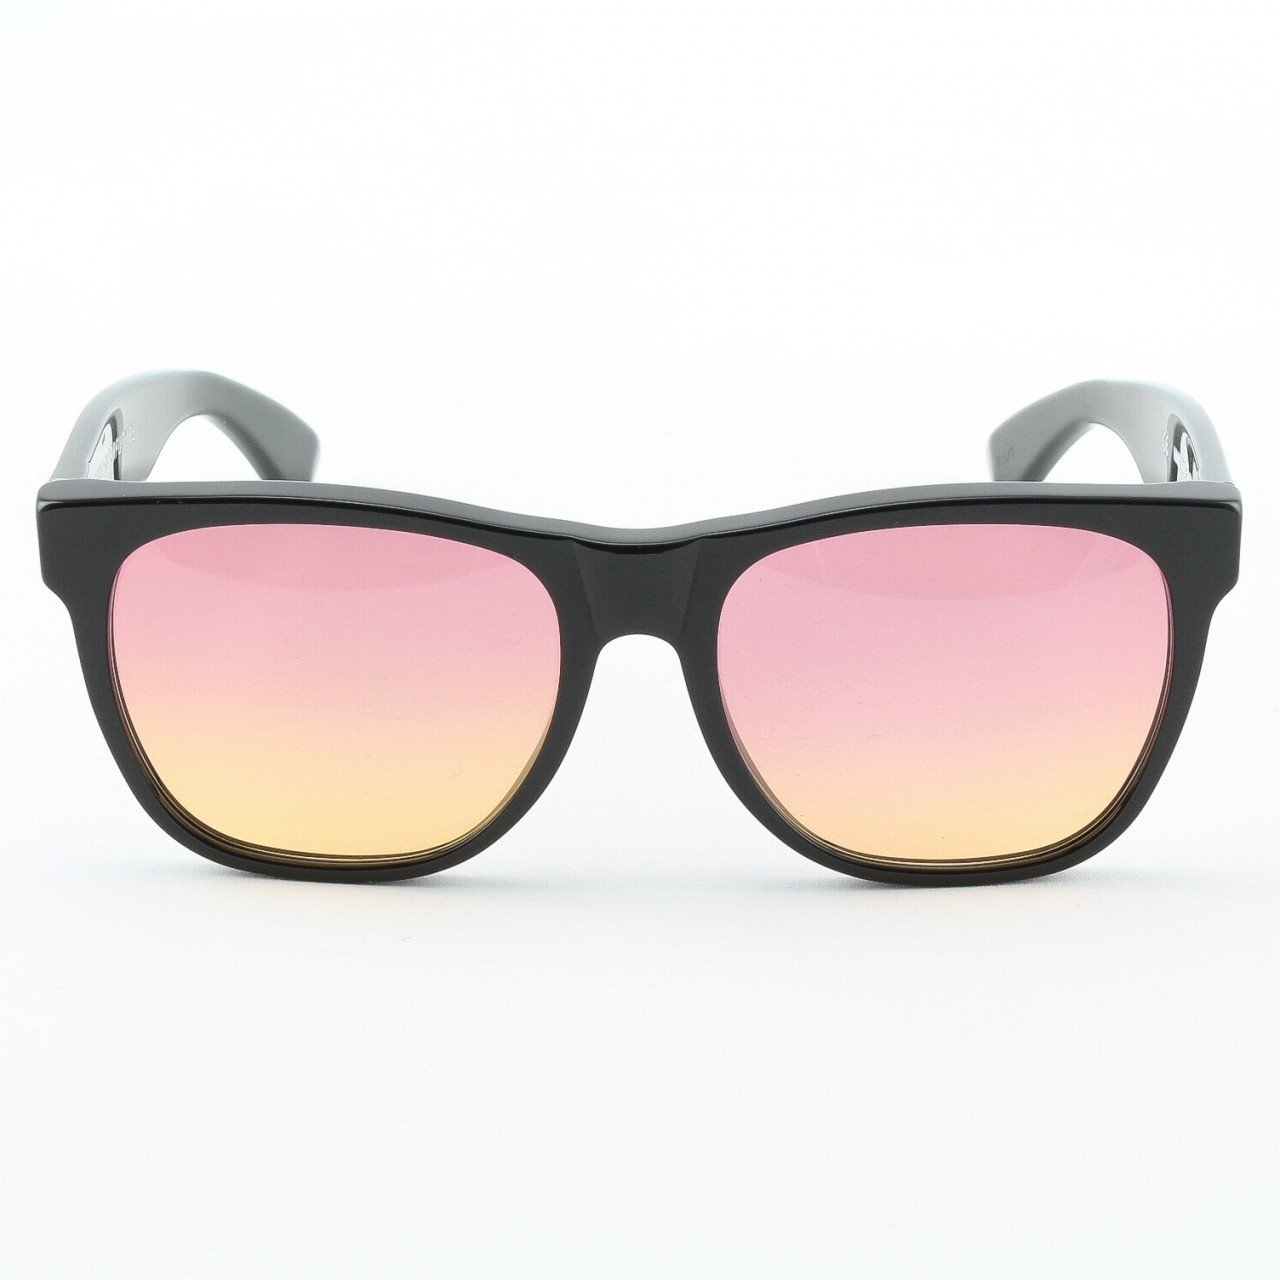 Super Classic 205 Wayfarer Sunglasses Black with Pink Lenses by RETROSUPERFUTURE